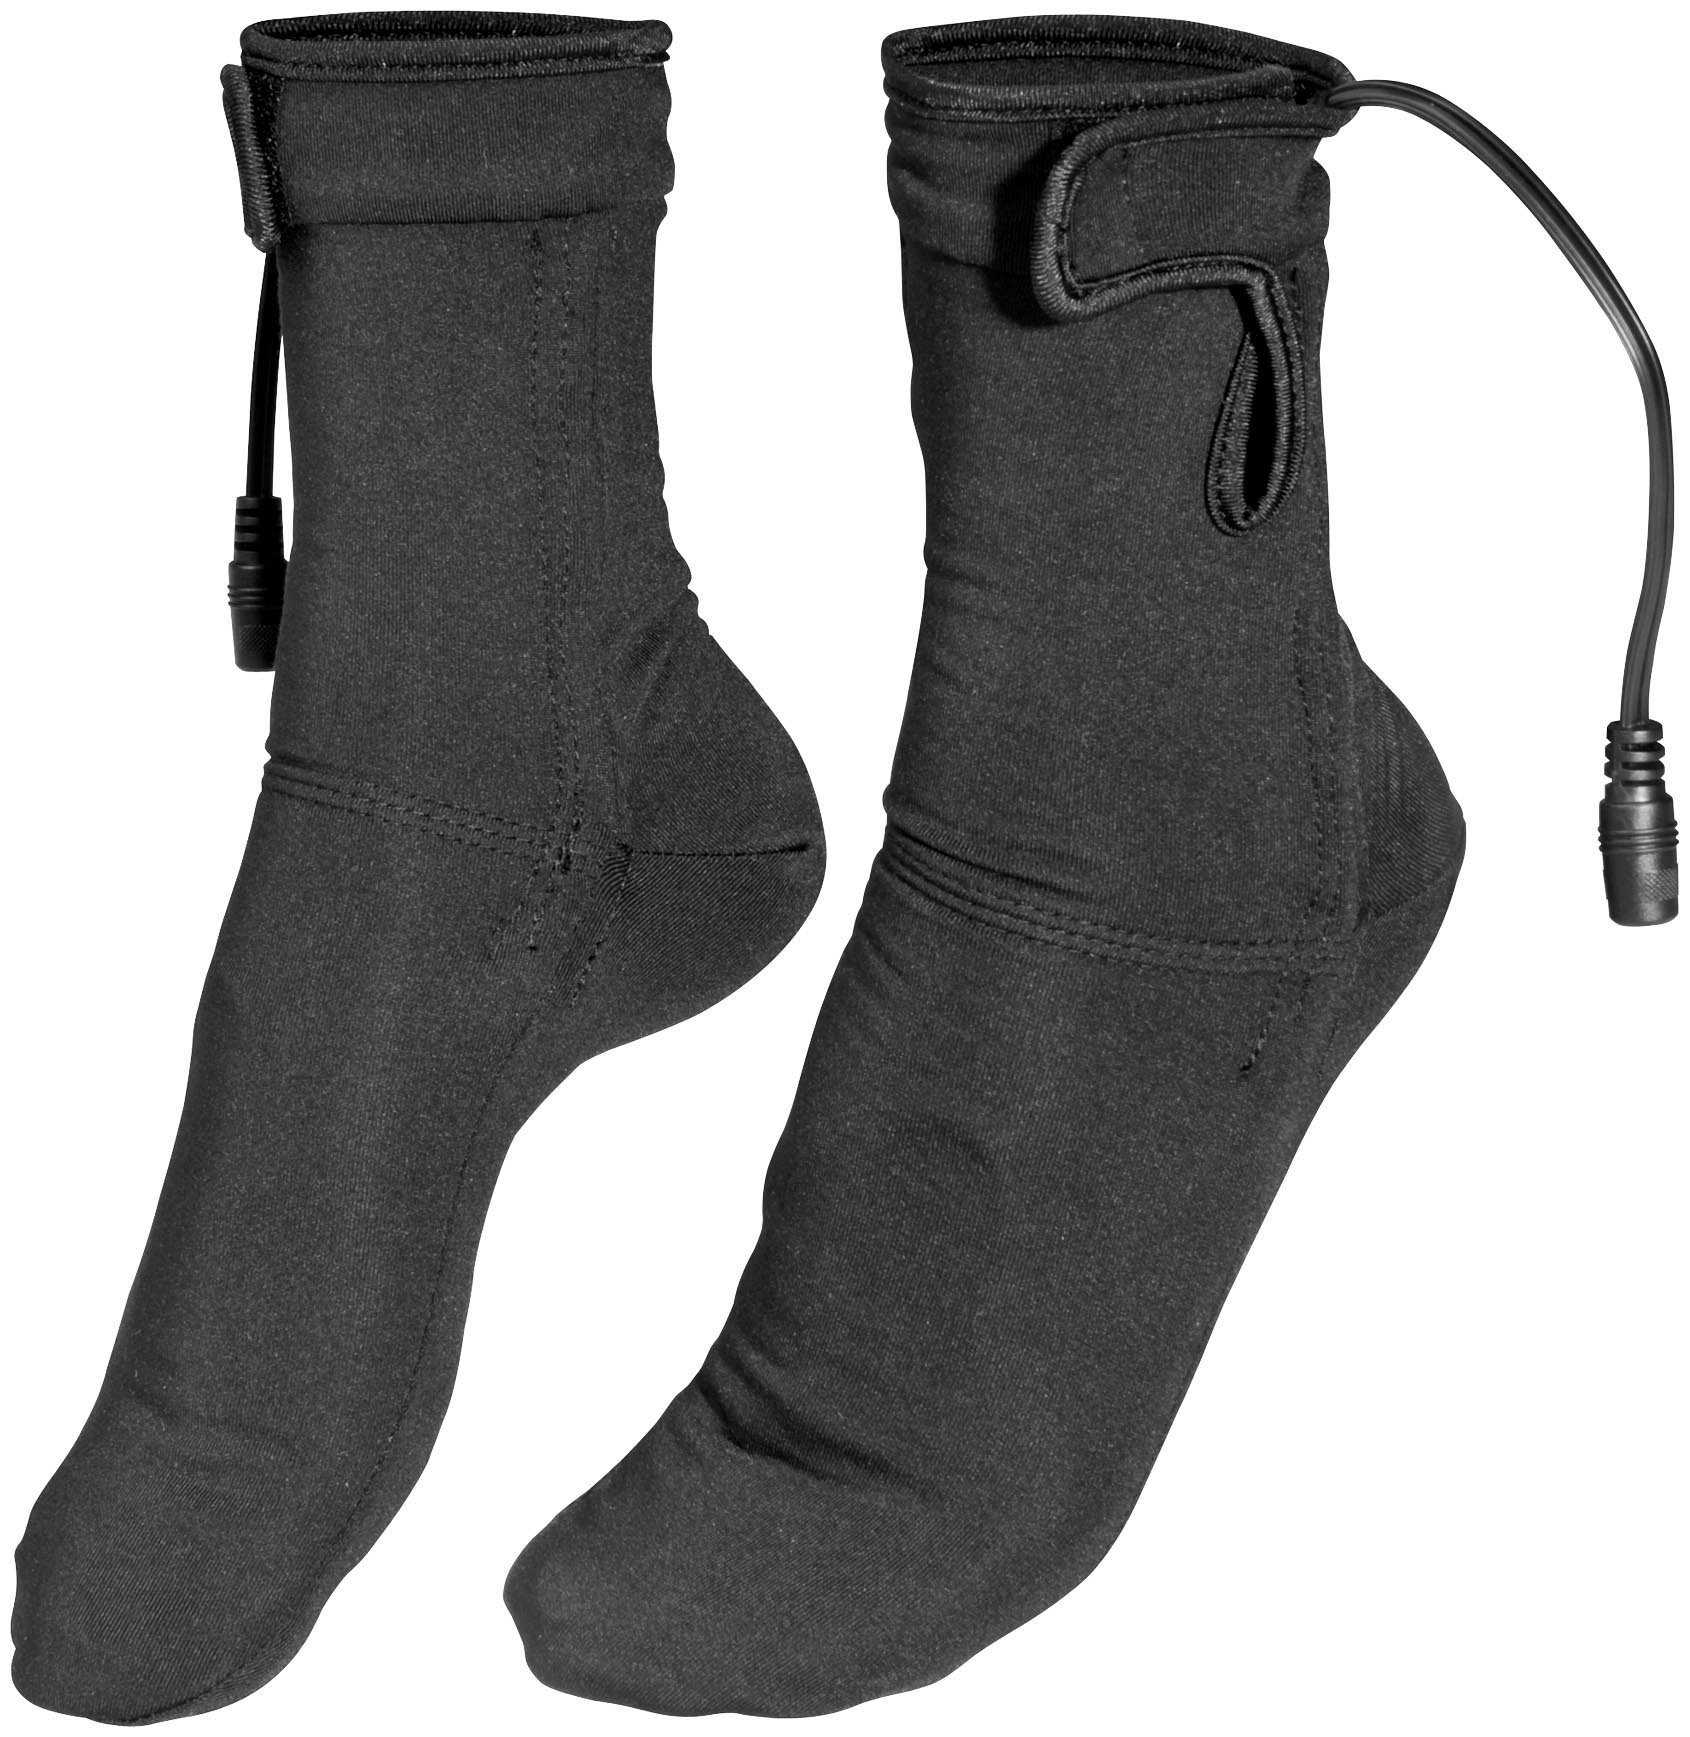 Firstgear Heated Socks (MEDIUM) (BLACK) for Motorcycle Riders